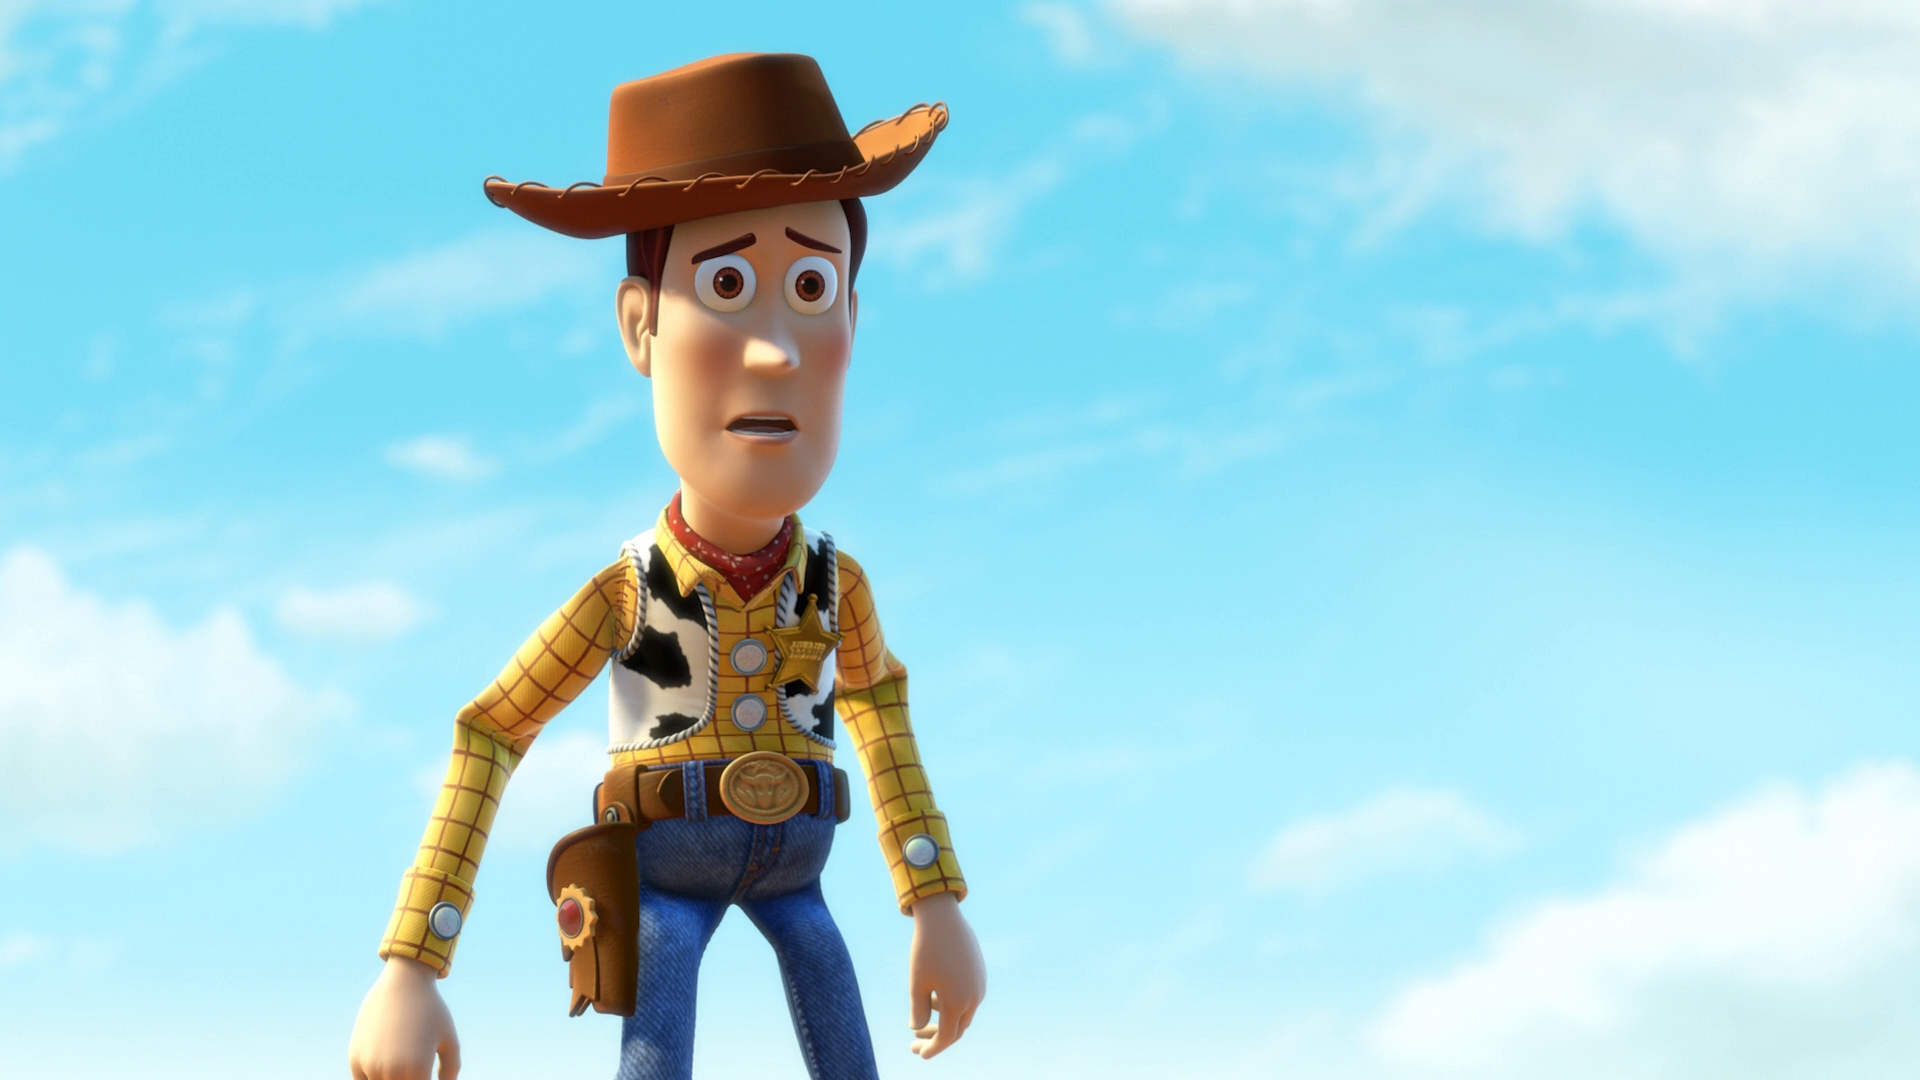 Toy Story Movies Collection 1995-2019 1080p BluRay x264 - LameyHost المجموعة الكاملة مدبلجة للغة العربية تحميل تورنت 6 arabp2p.com